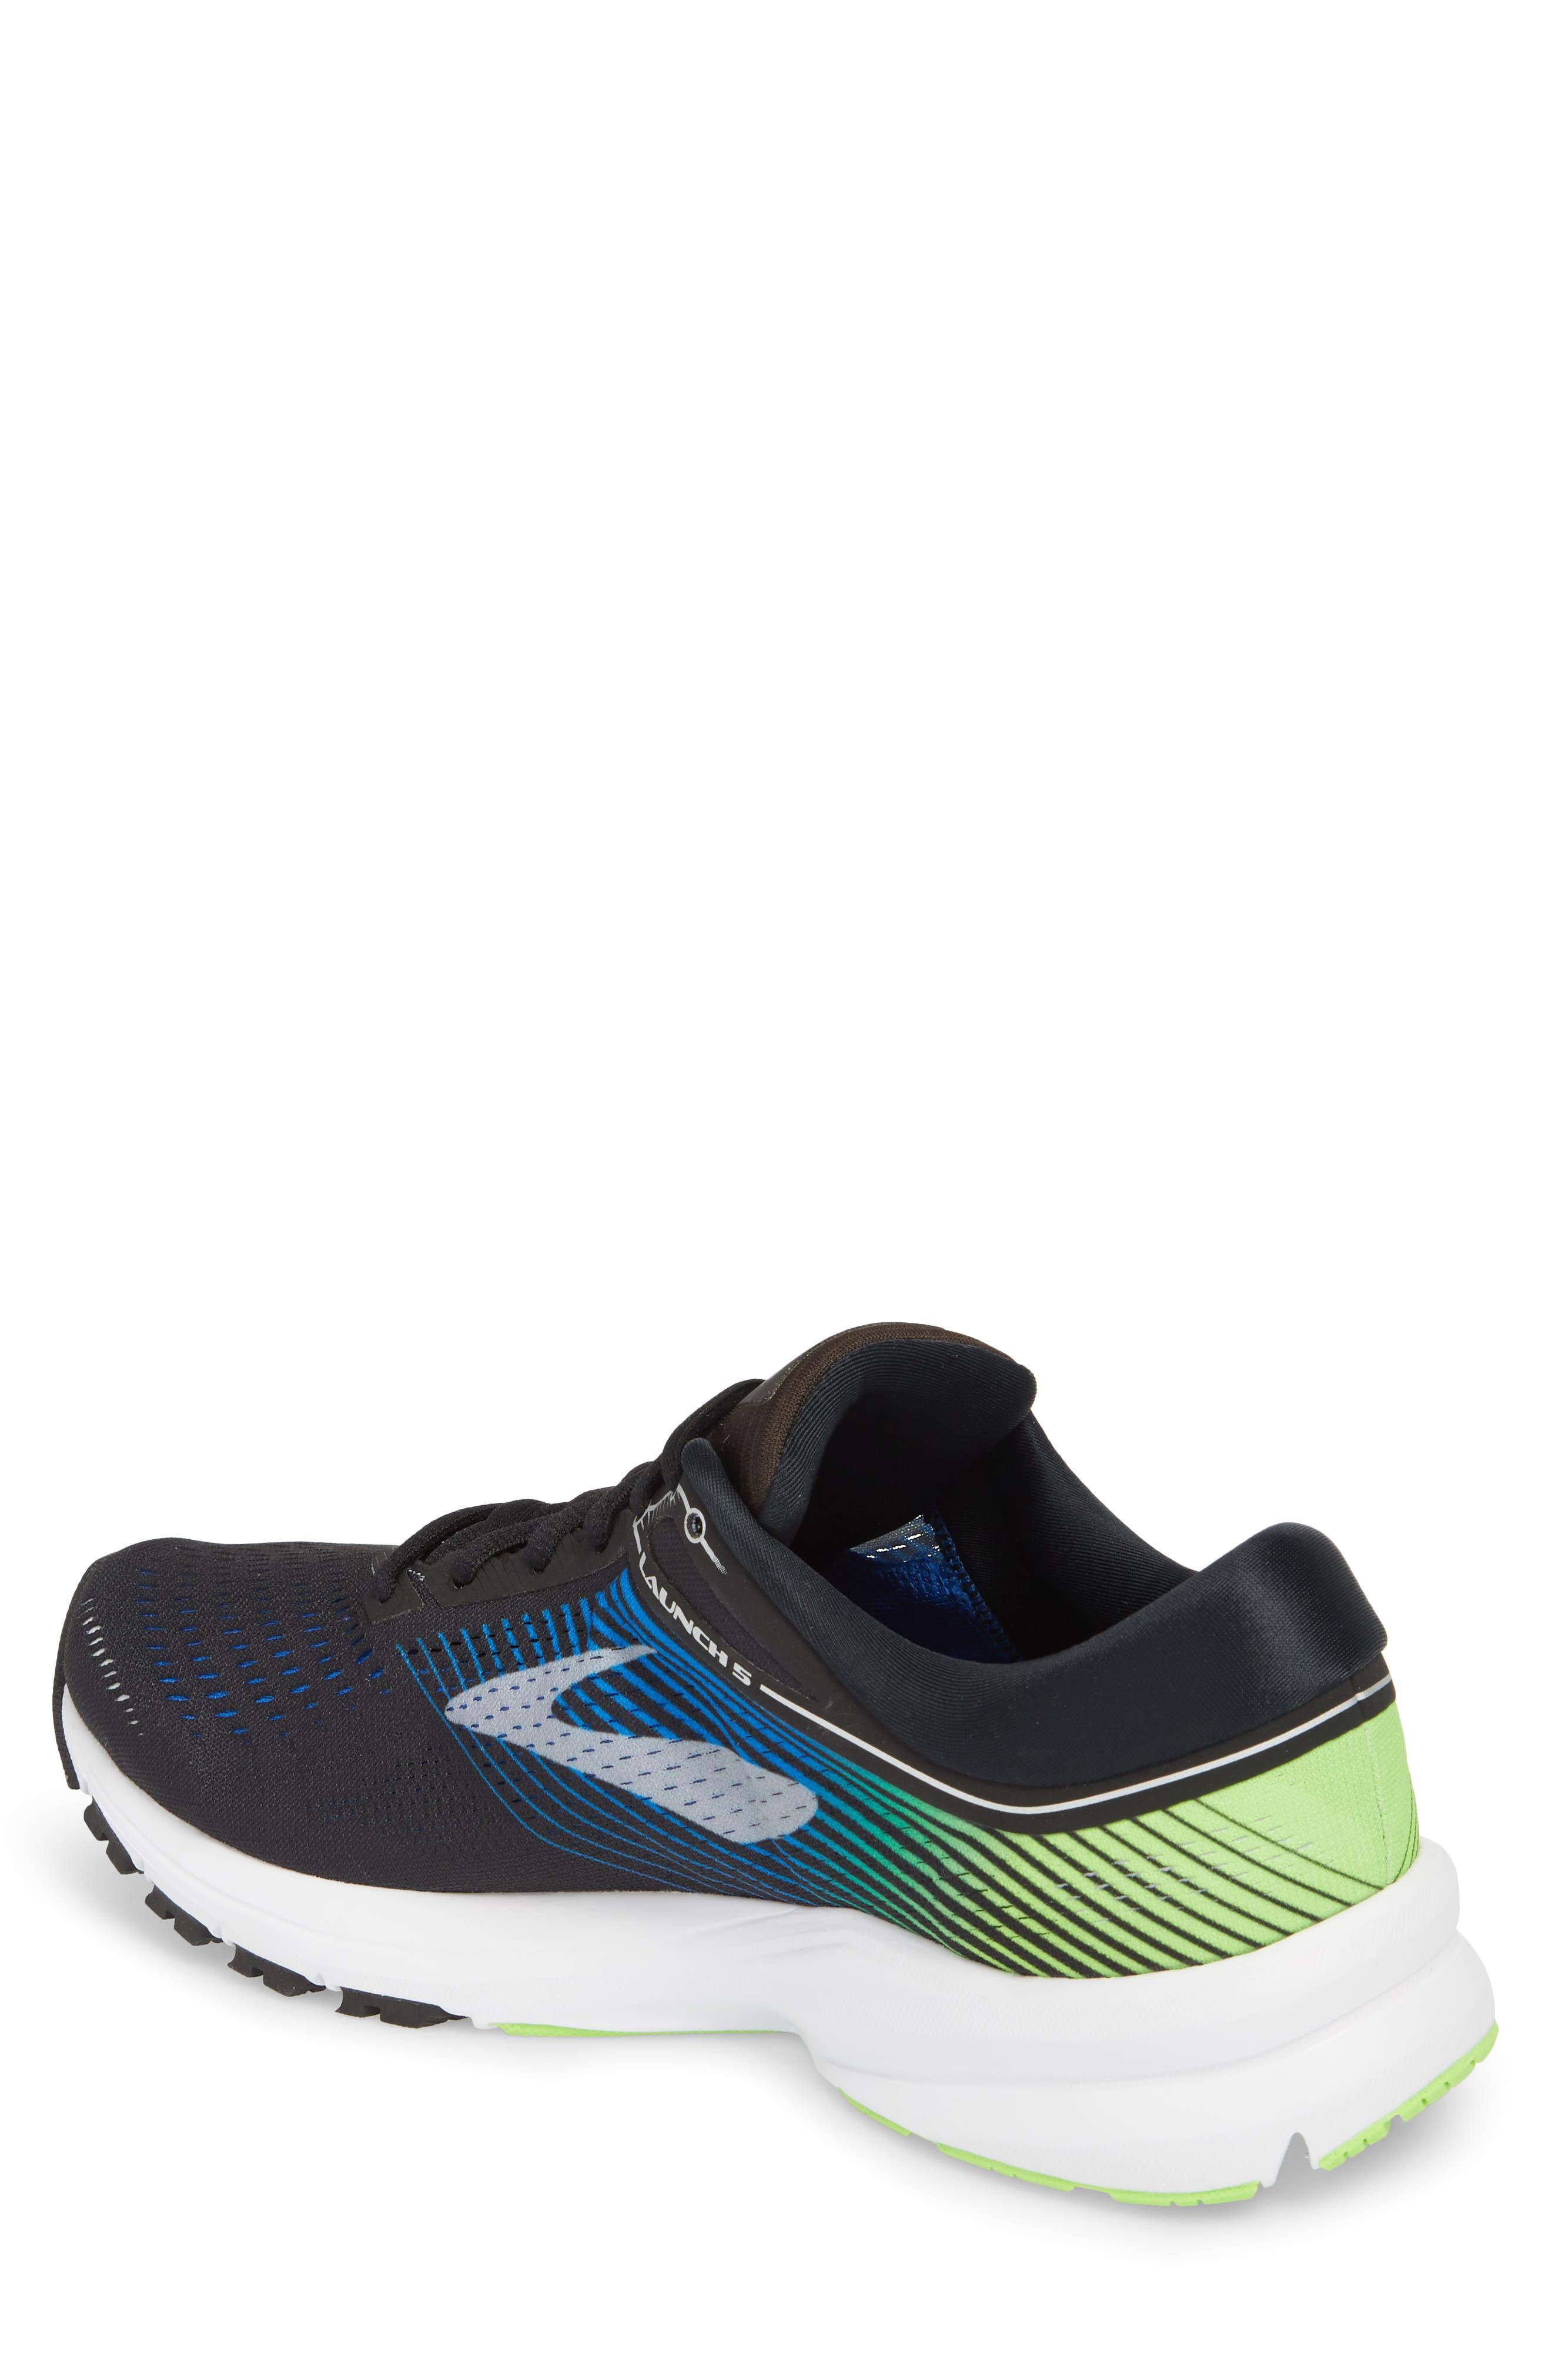 Launch 5 Running Shoe,                             Alternate thumbnail 2, color,                             016